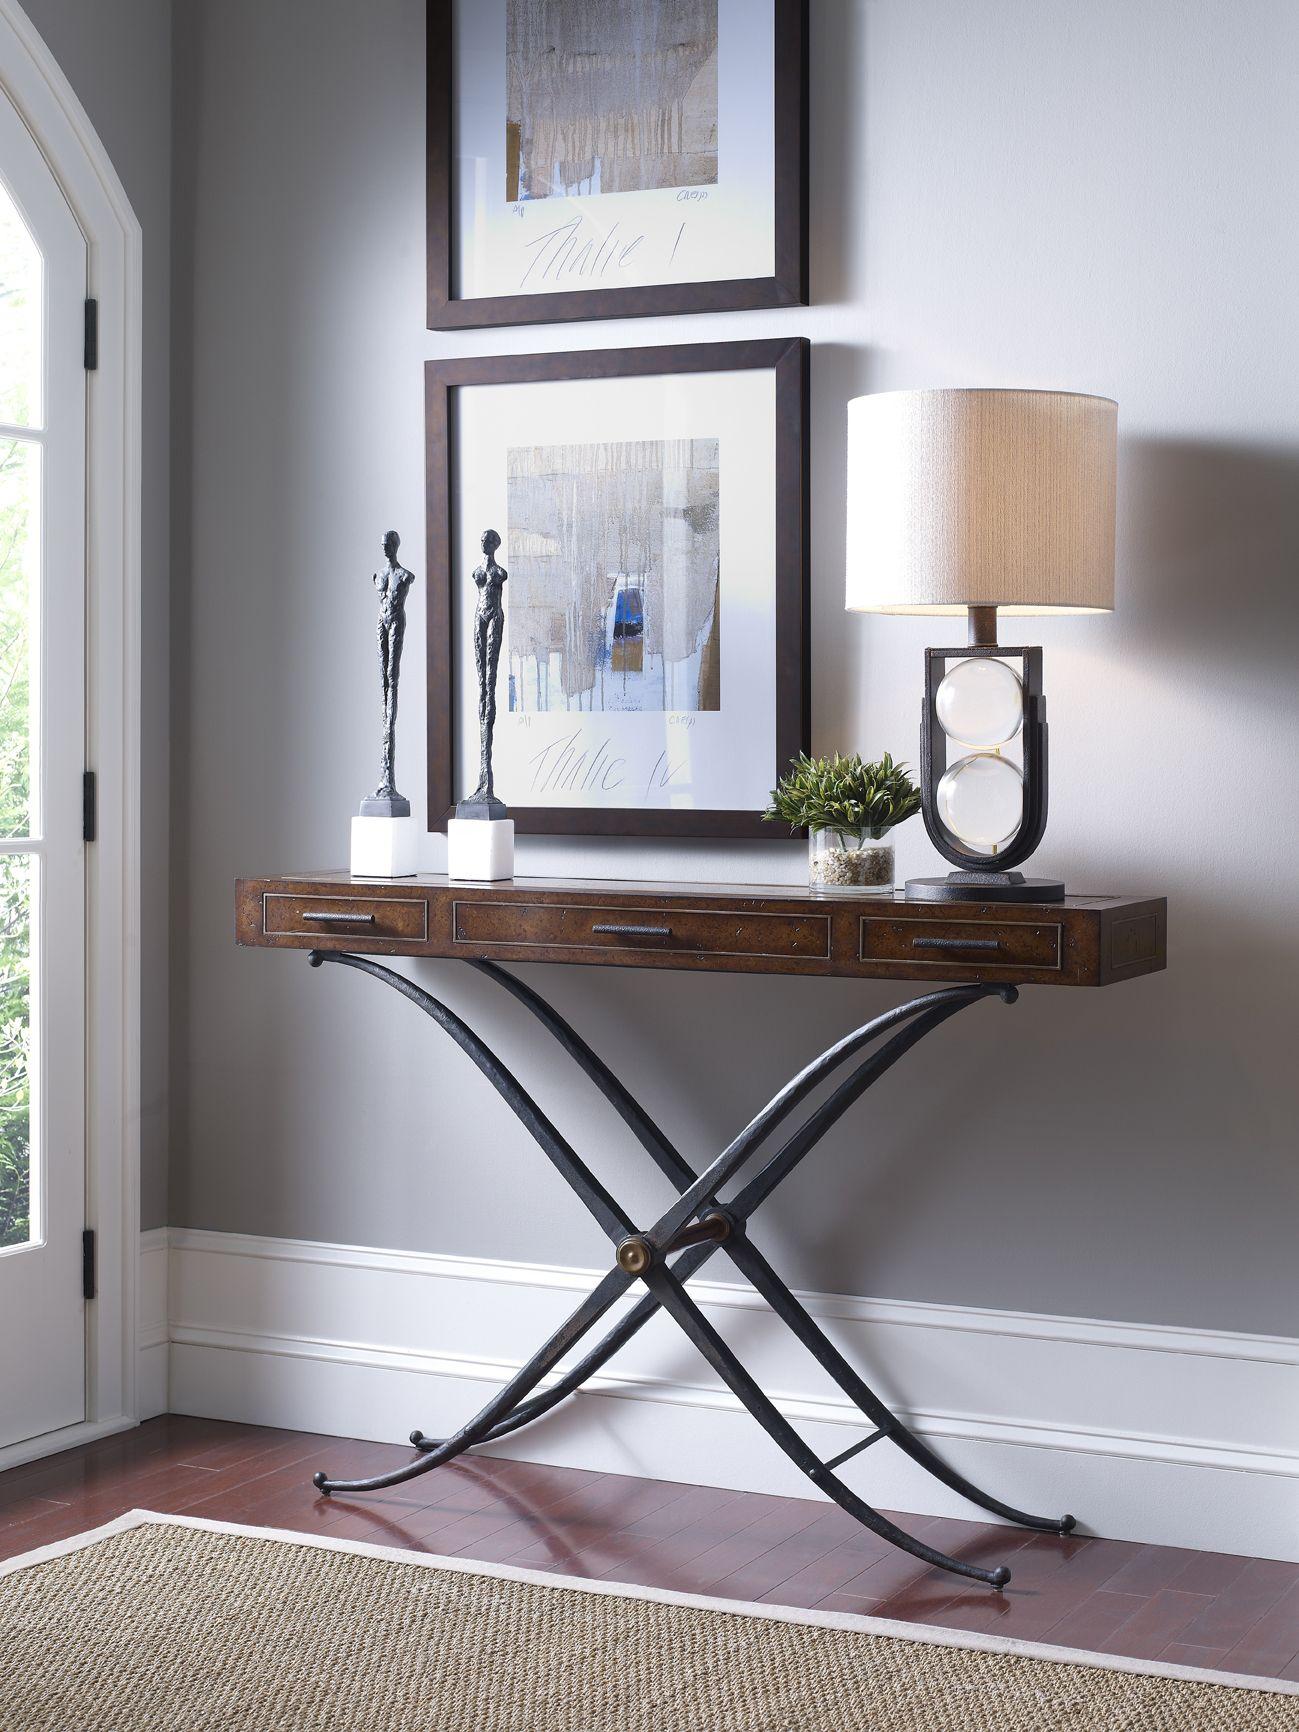 Burr oak veneered rectangular console table with inset brass burr oak veneered rectangular console table with inset brass beading and three drawers the x geotapseo Choice Image